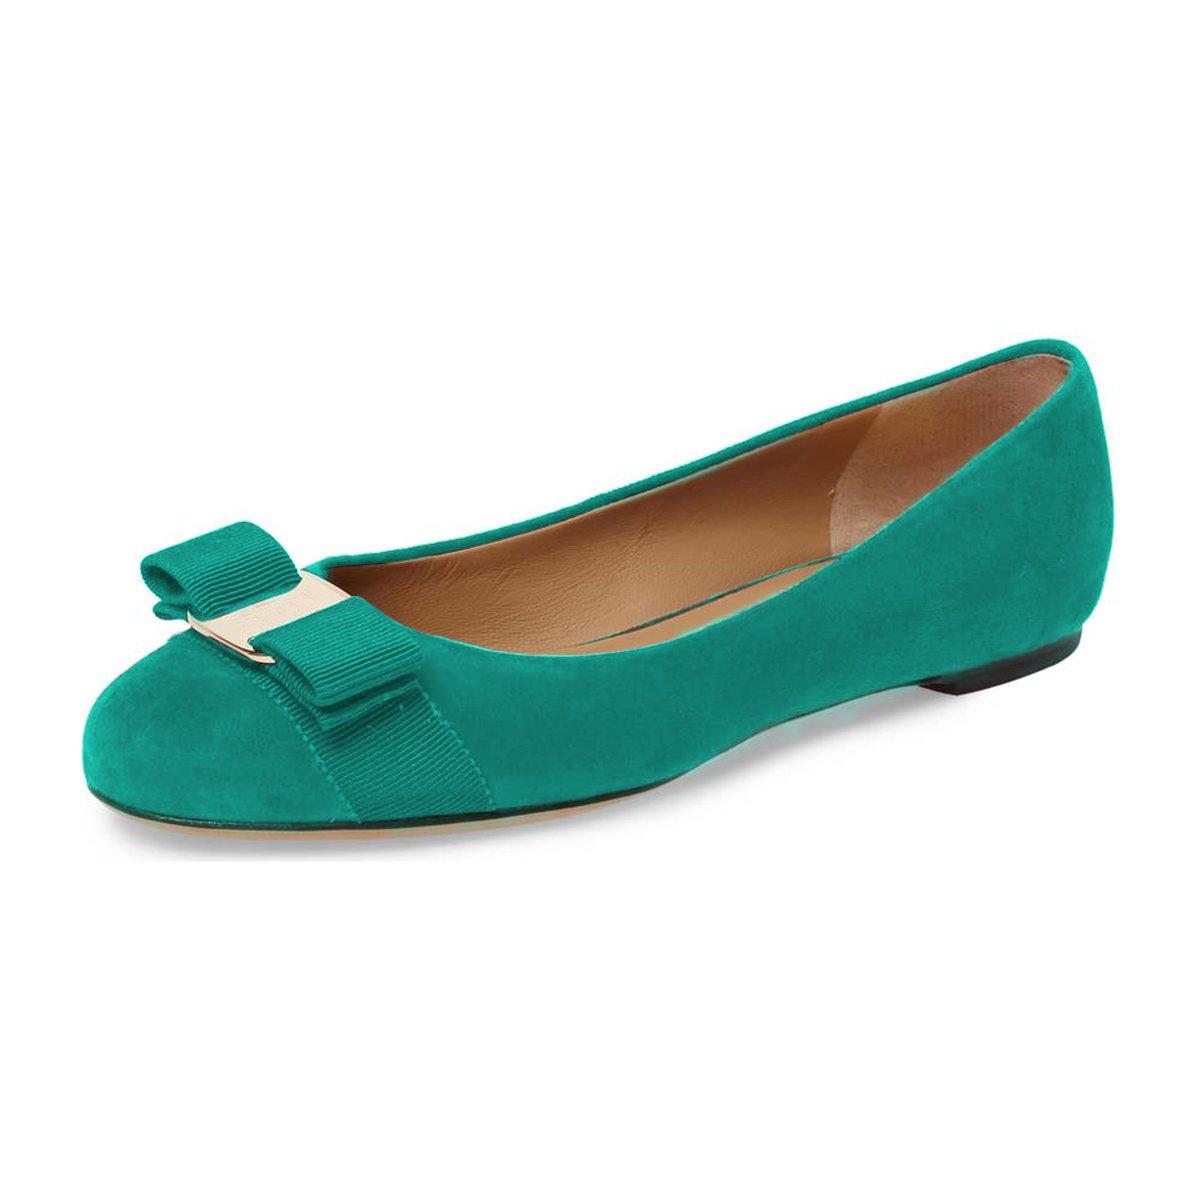 FSJ Women Cute Bowknot Round Toe Ballet Flats Slip On Casual Office Comfy Pumps Shoes Size 4-15 US B077P7XC17 8.5 B(M) US|Sea Green